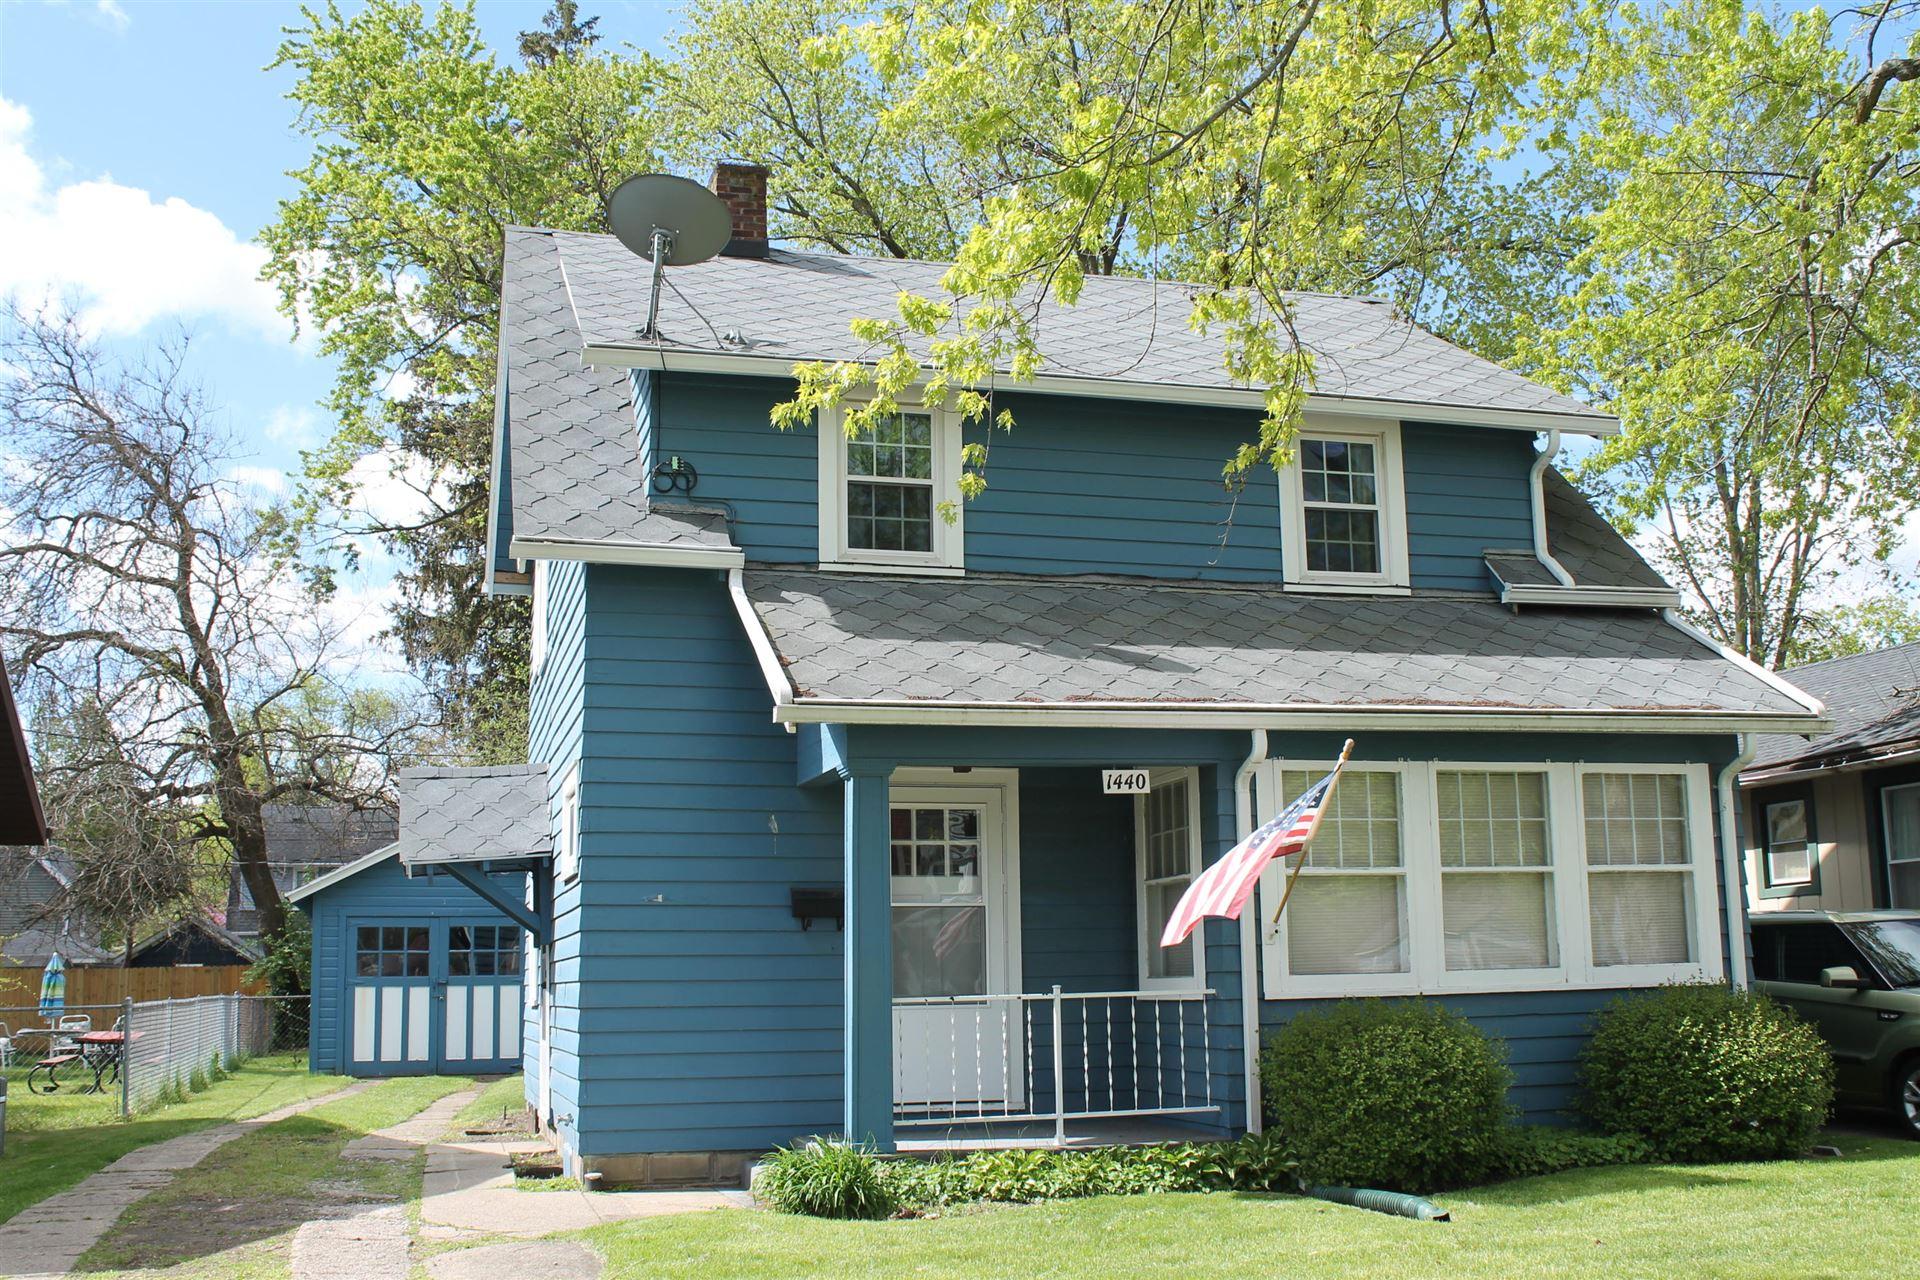 1440 Sycamore Street, Niles, MI 49120 - MLS#: 21016741